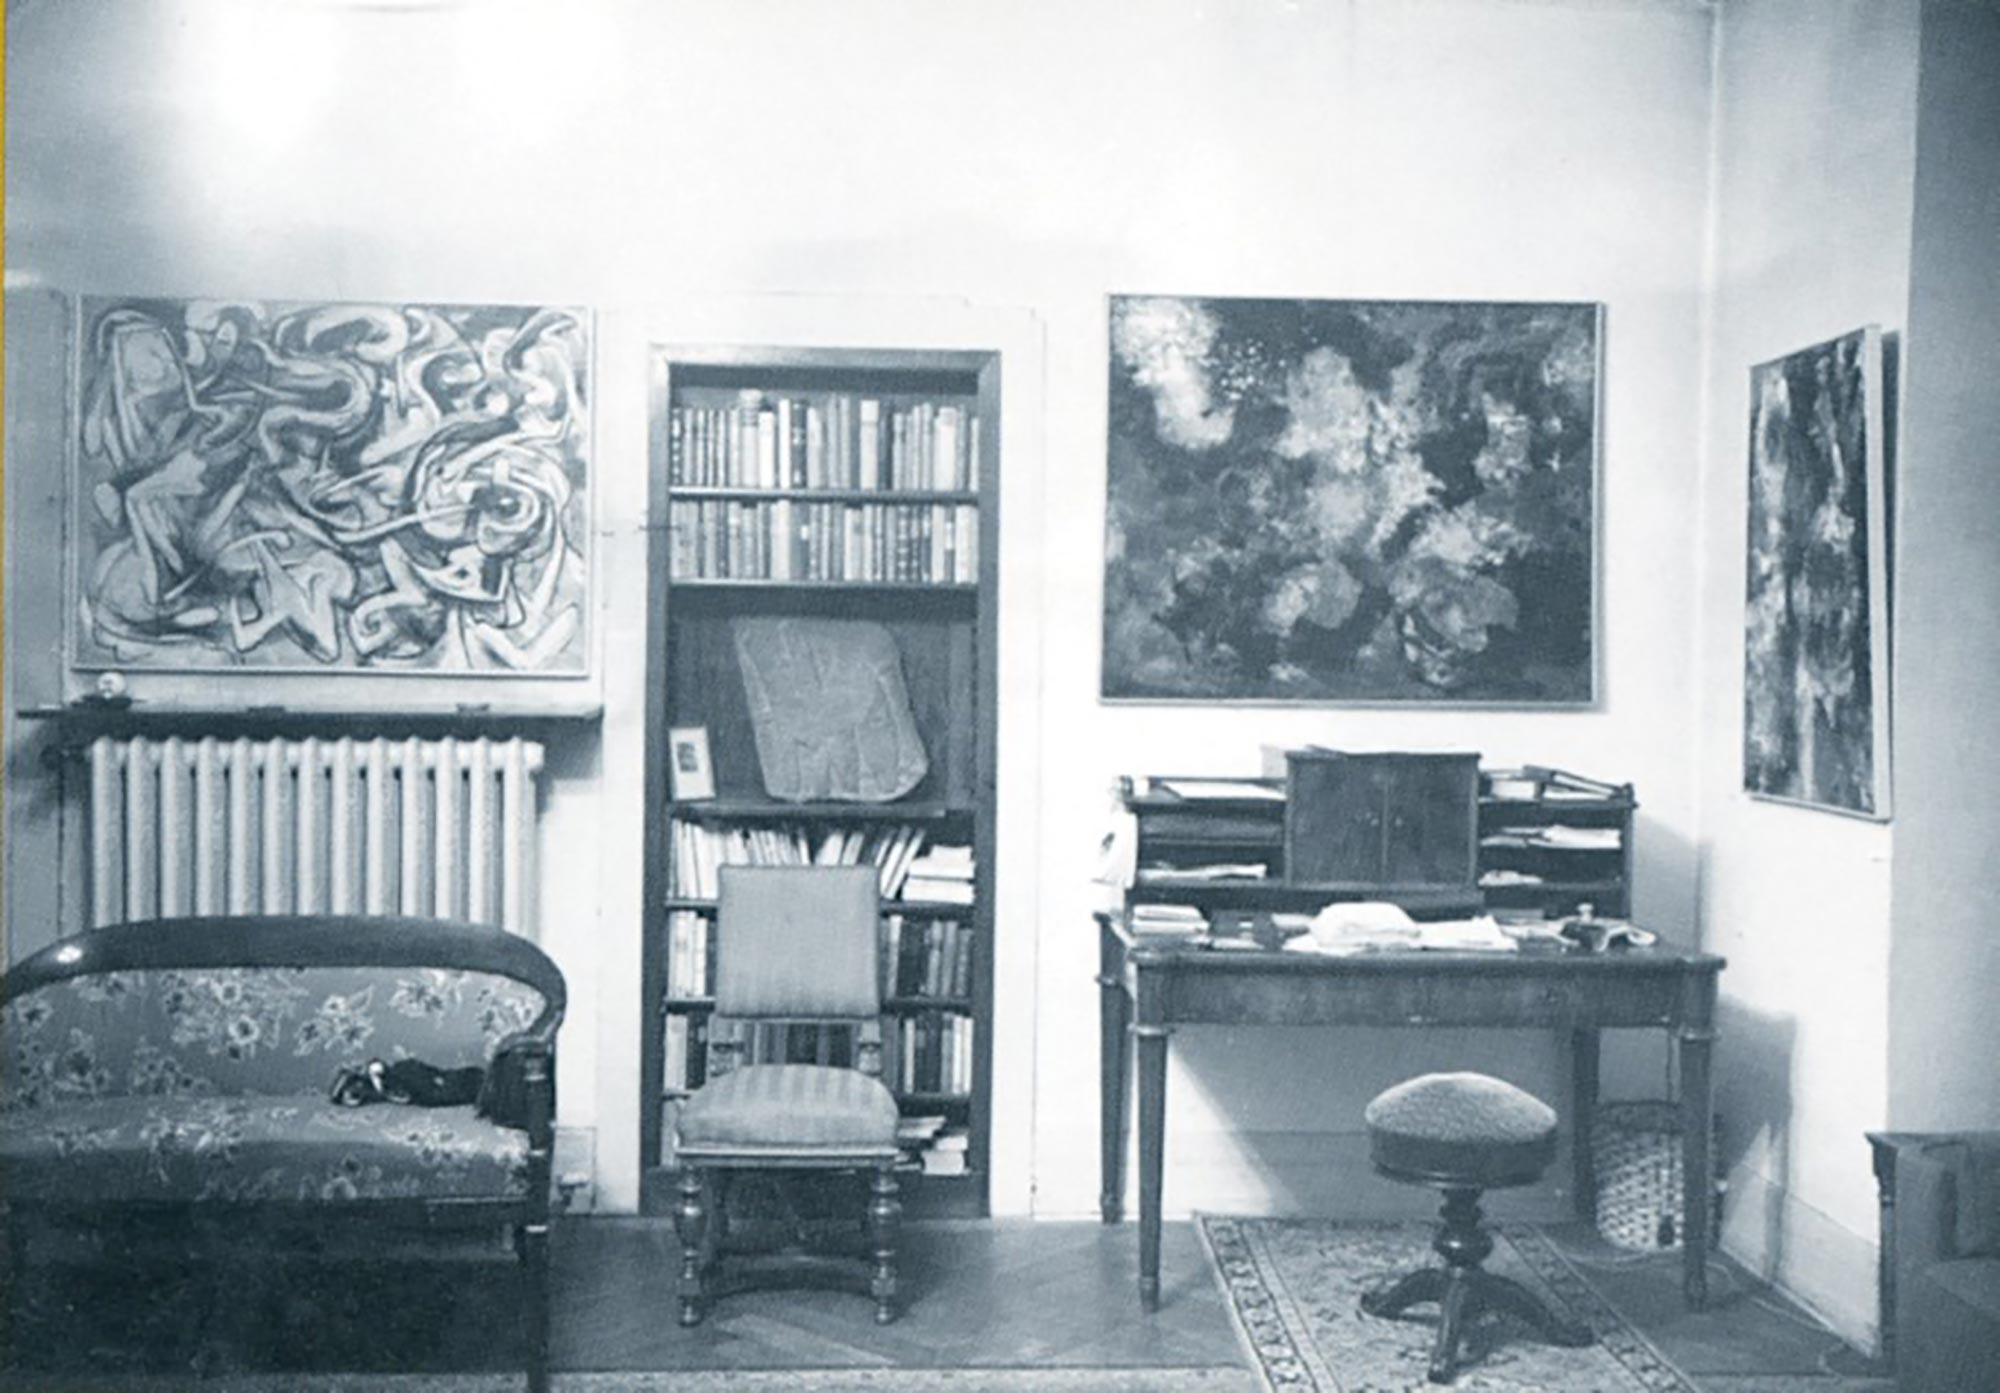 "1 + 2 Zimmergalerie Franck, Ausstellung der ""Neu-Expressionisten"" (Quadriga), Dezember 1952, Nachlass Klaus Franck"